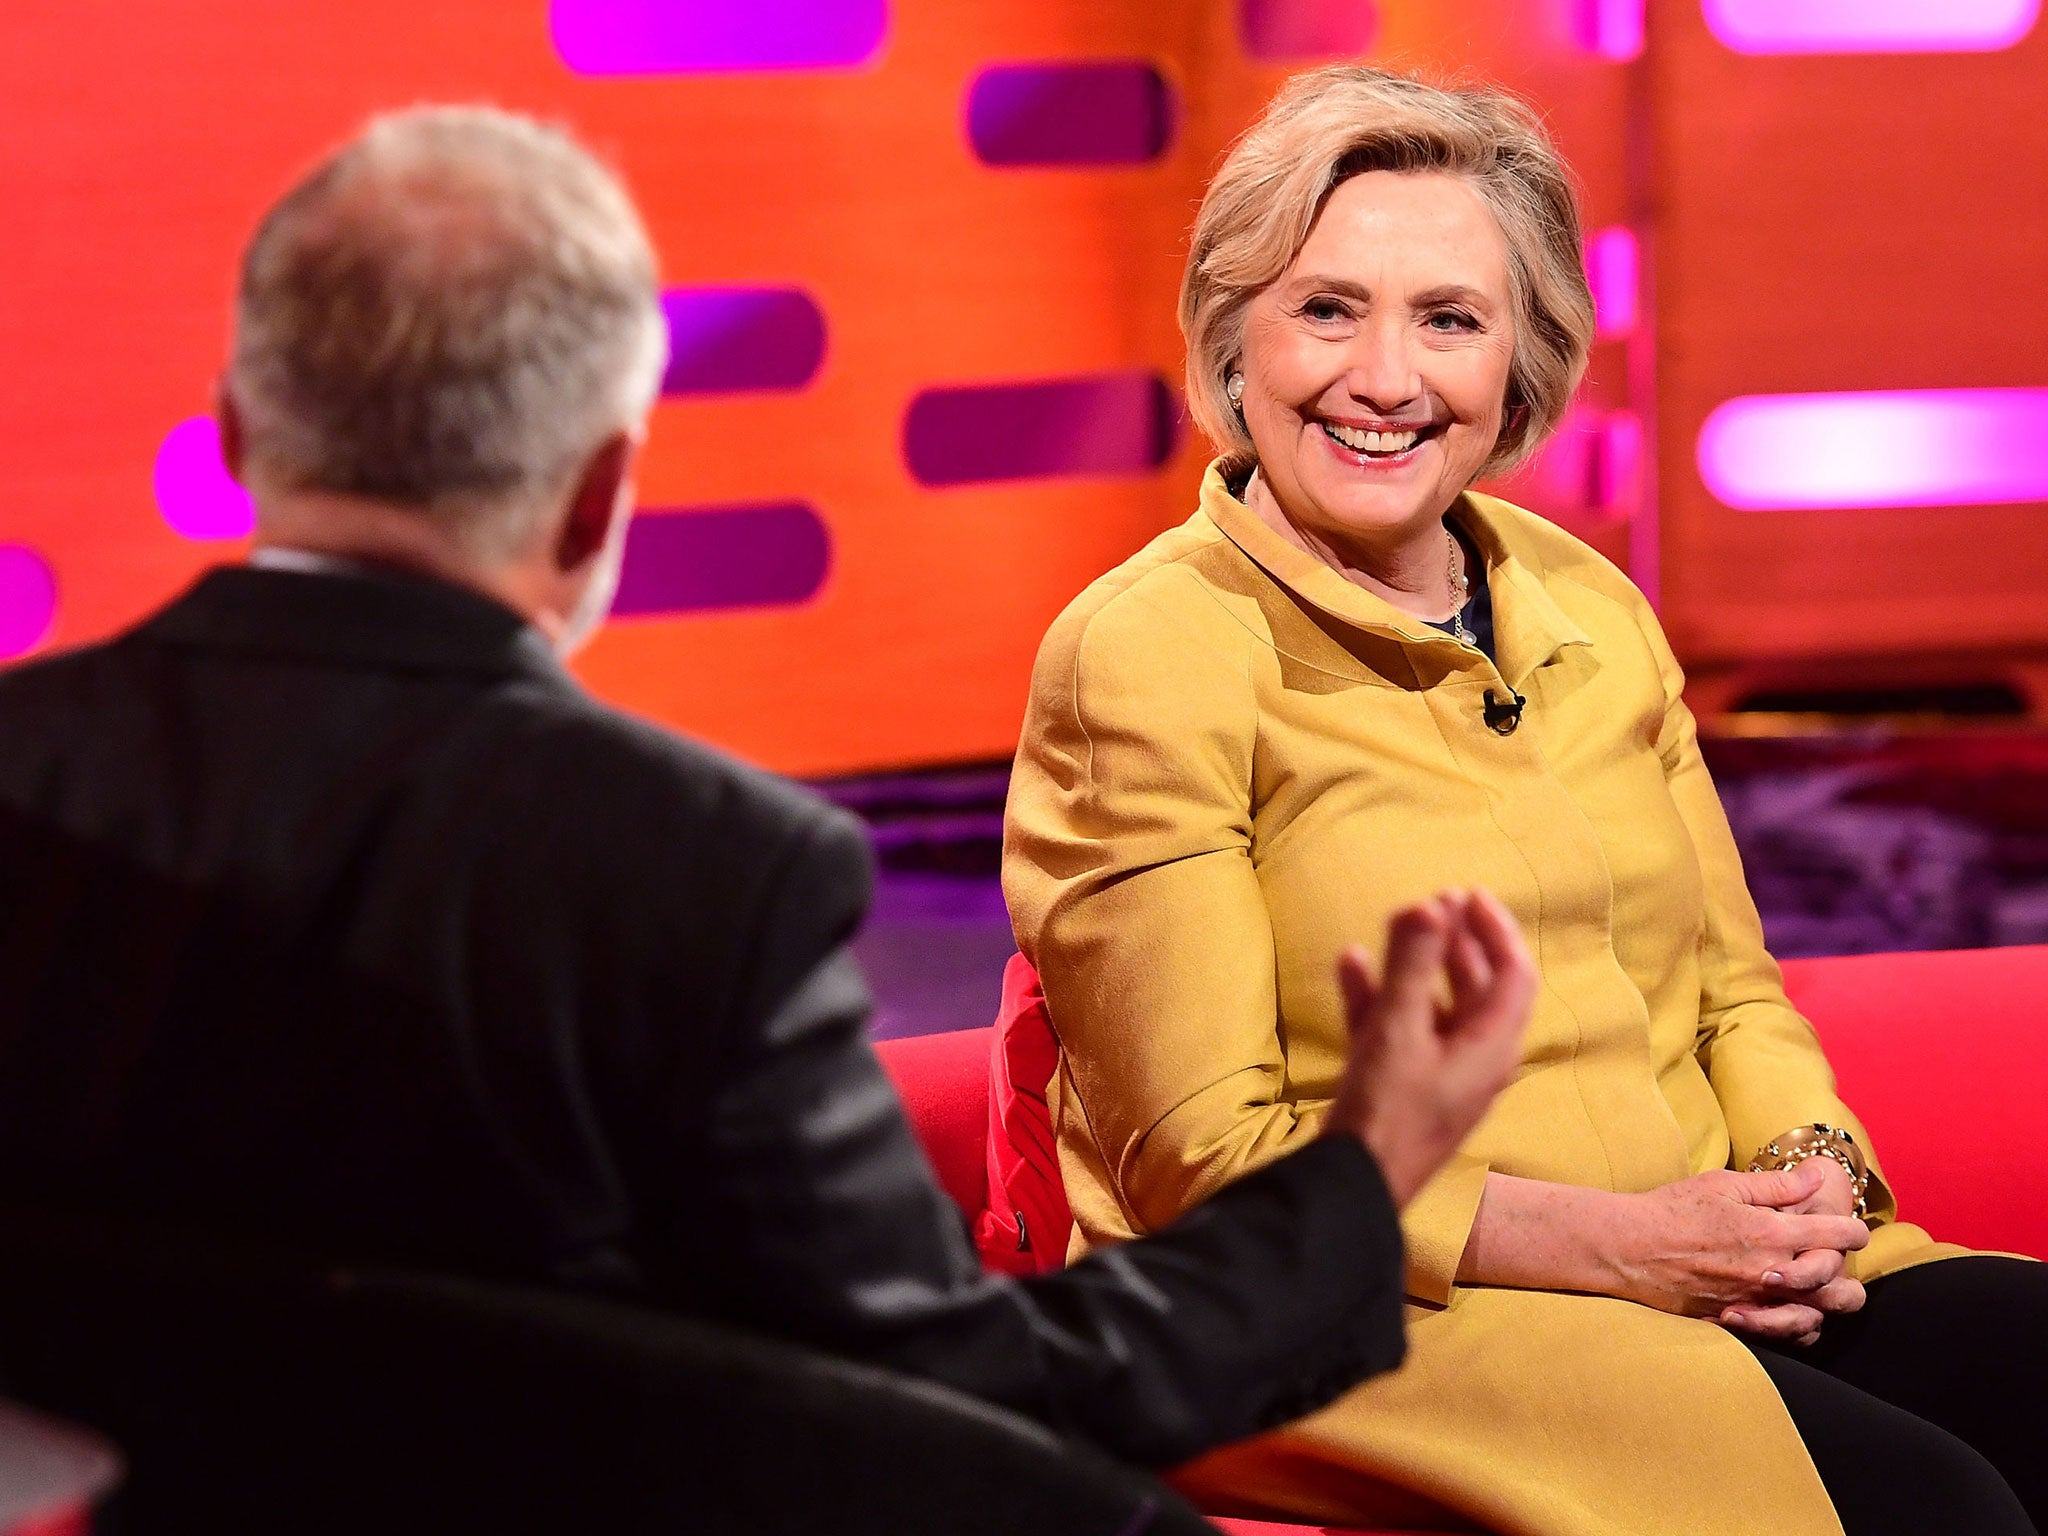 Hillary Clinton condemns Donald Trump's 'dangerous' Twitter tirades